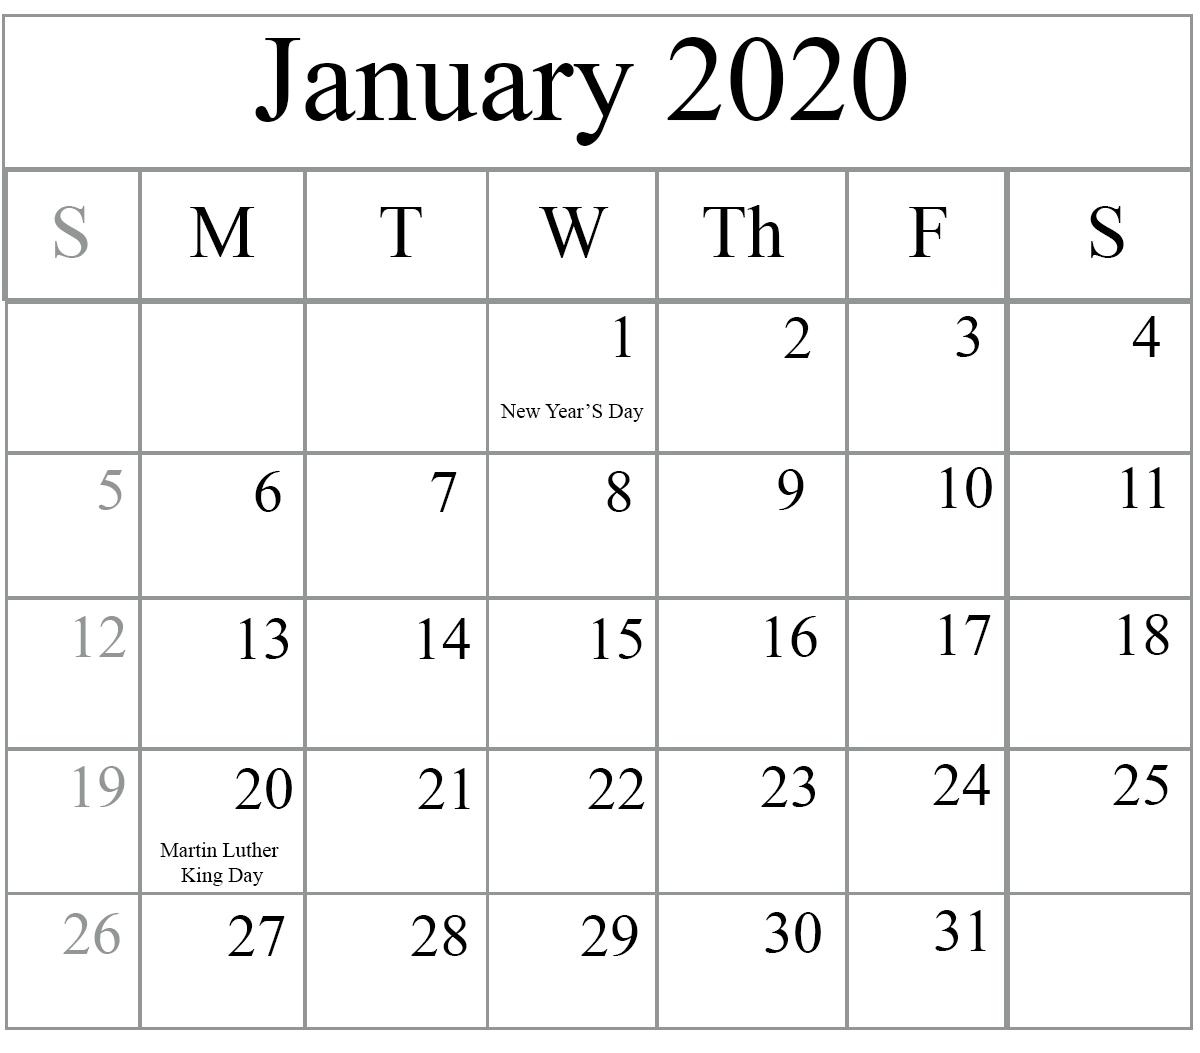 Free Calendar Template 2020 Word - Colona.rsd7 Perky 2020 Monthly Calendar Template Word